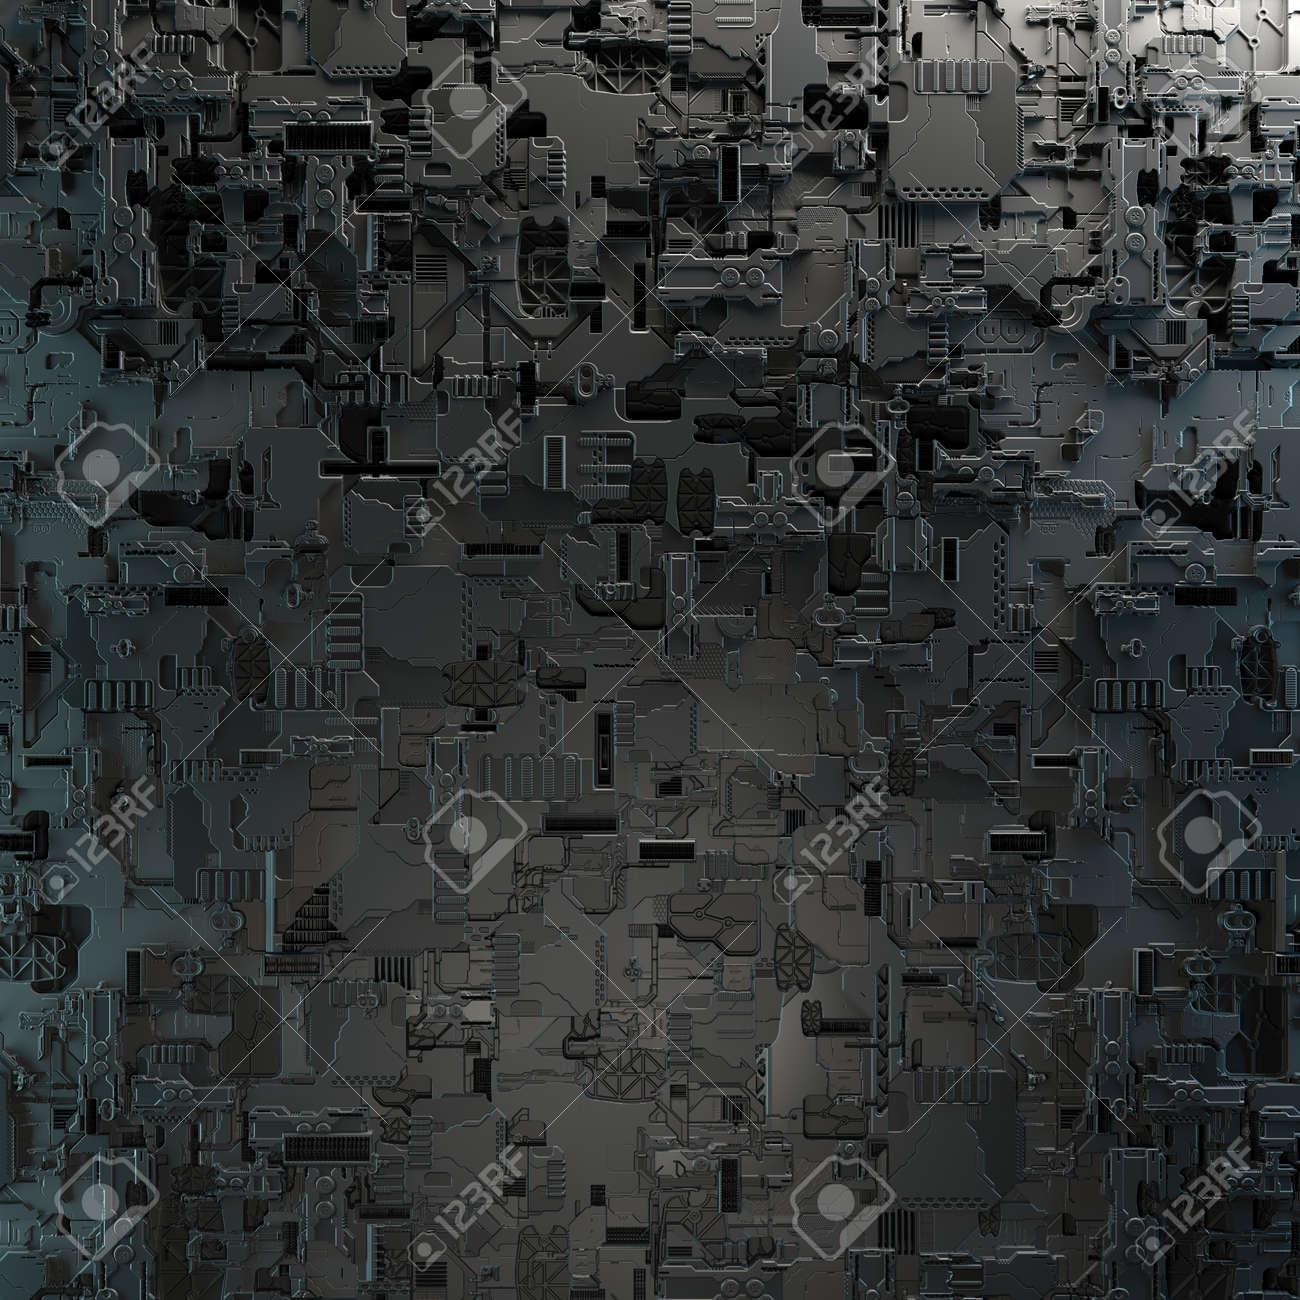 SciFi Panels. Futuristic texture. Spaceship hull geometric pattern. - 140882943